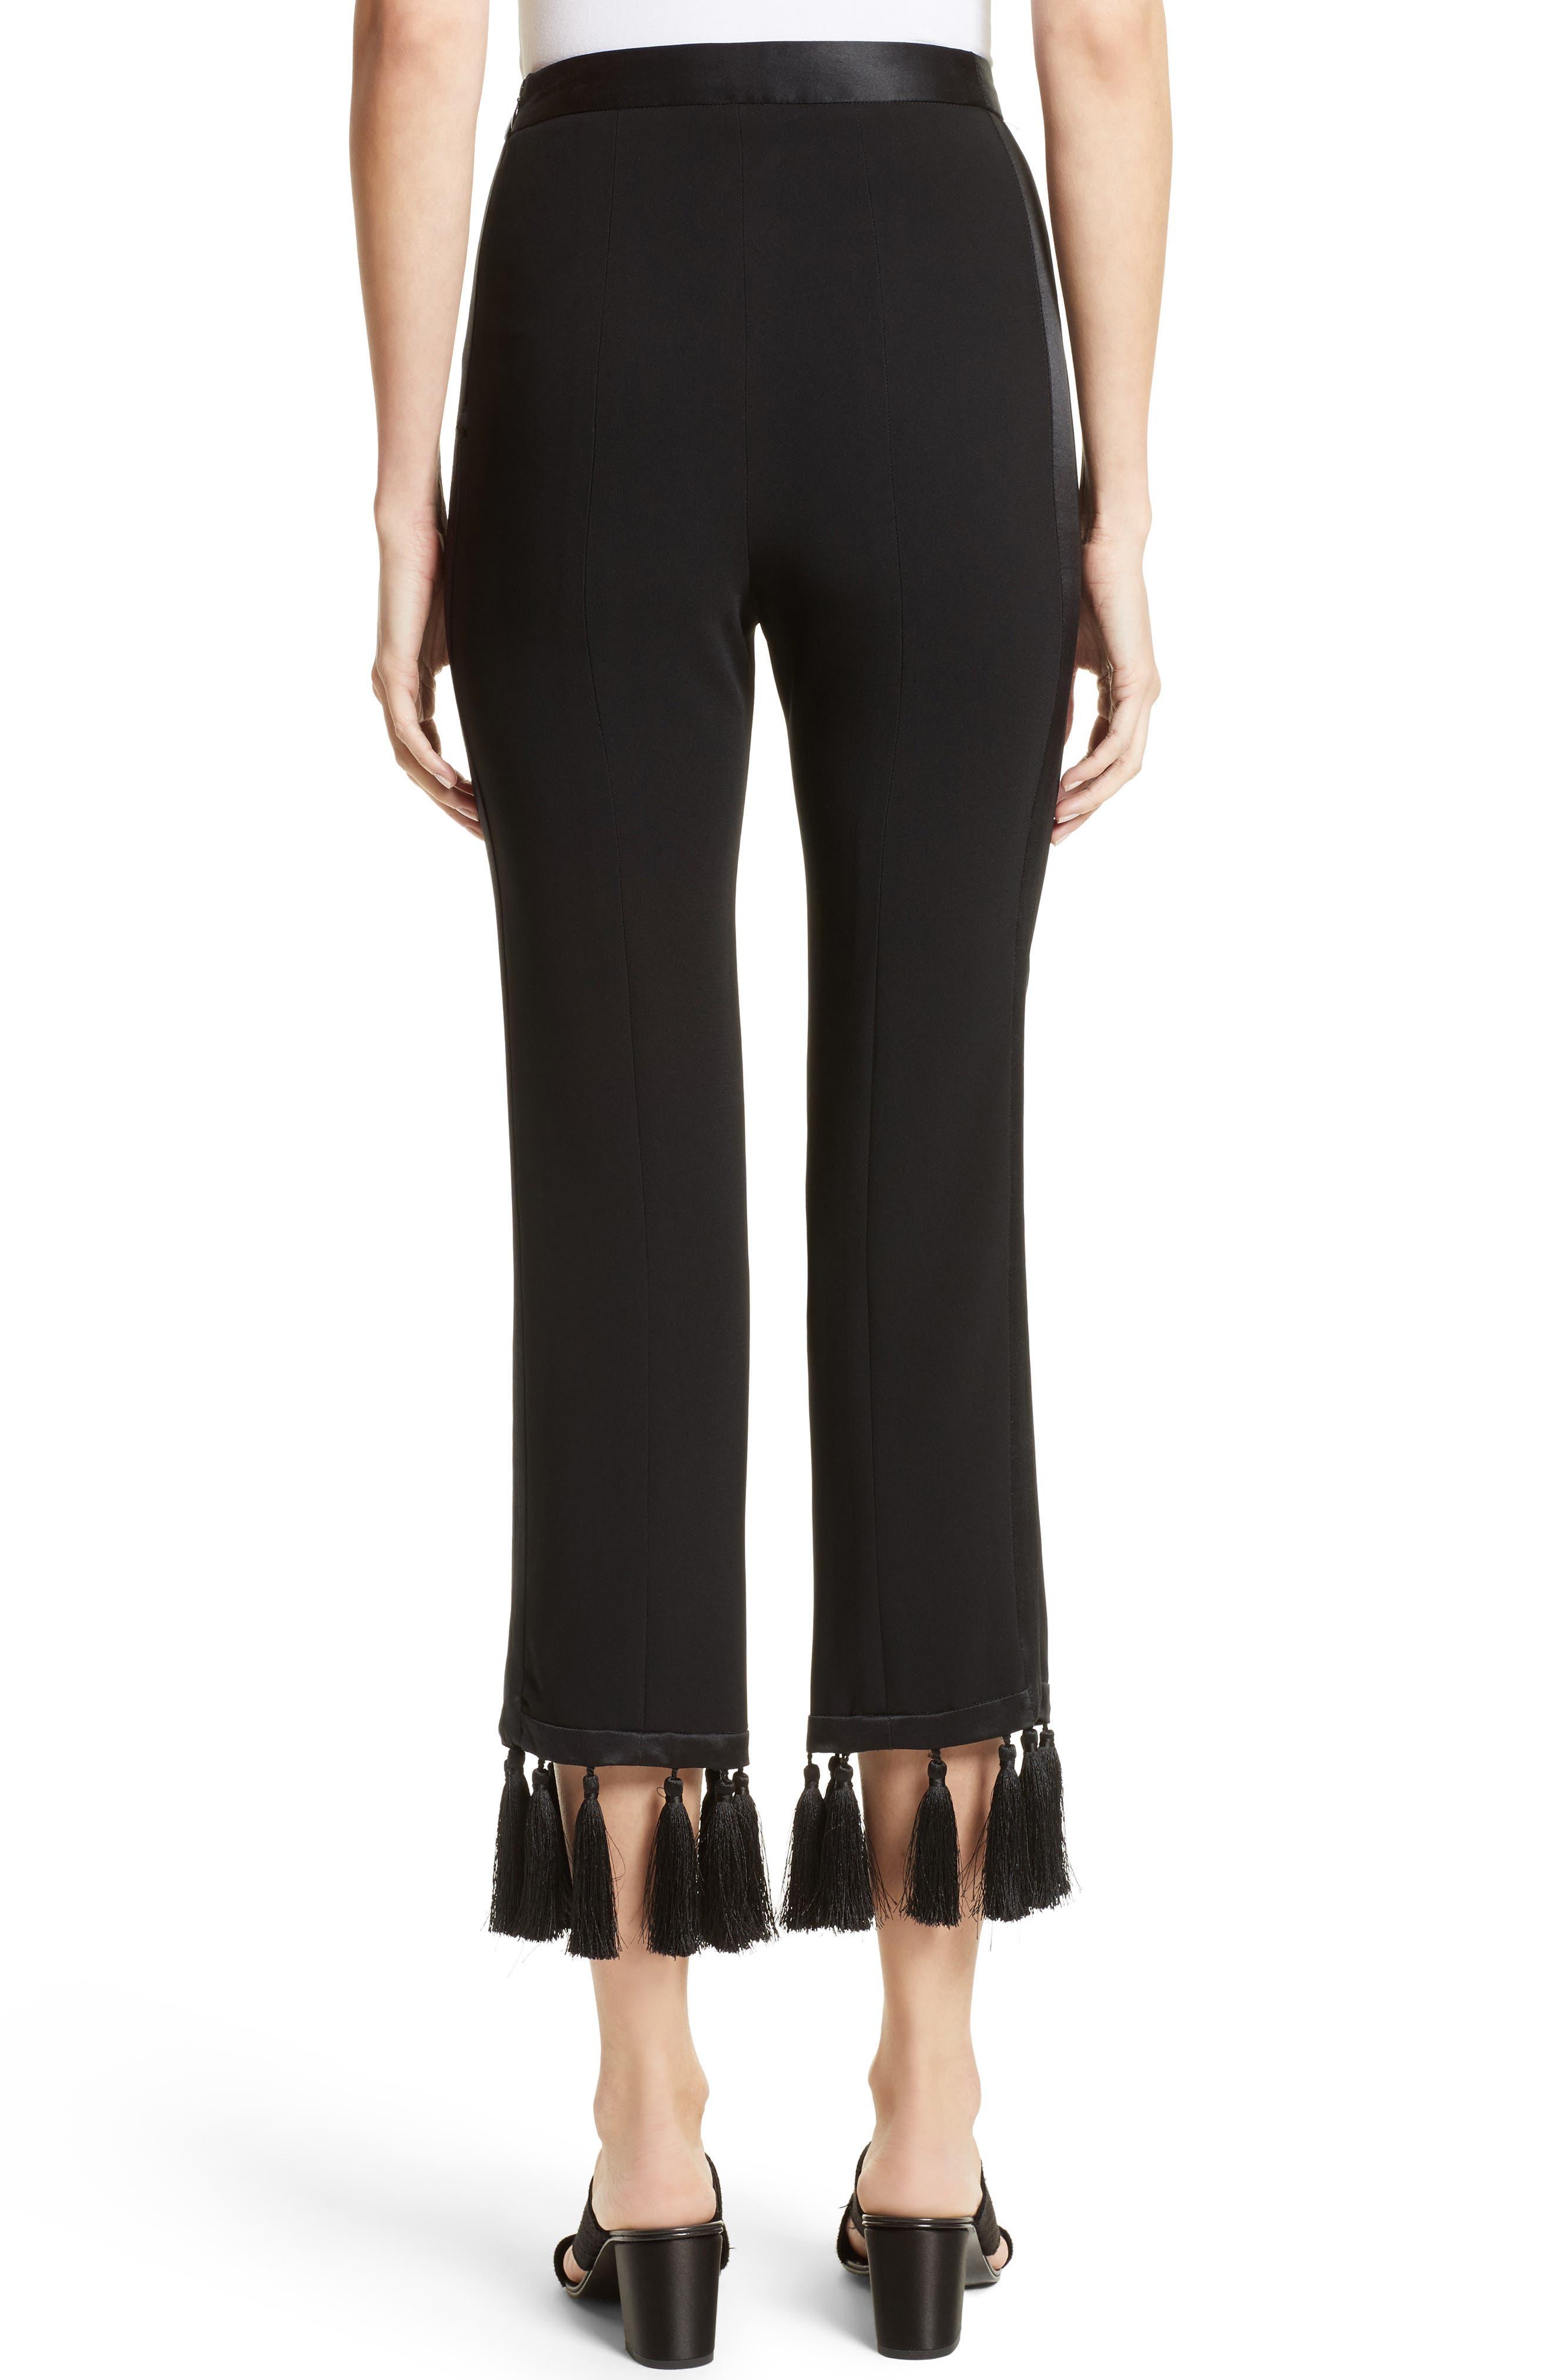 Tash Tassel Crepe Pants,                             Alternate thumbnail 3, color,                             Black